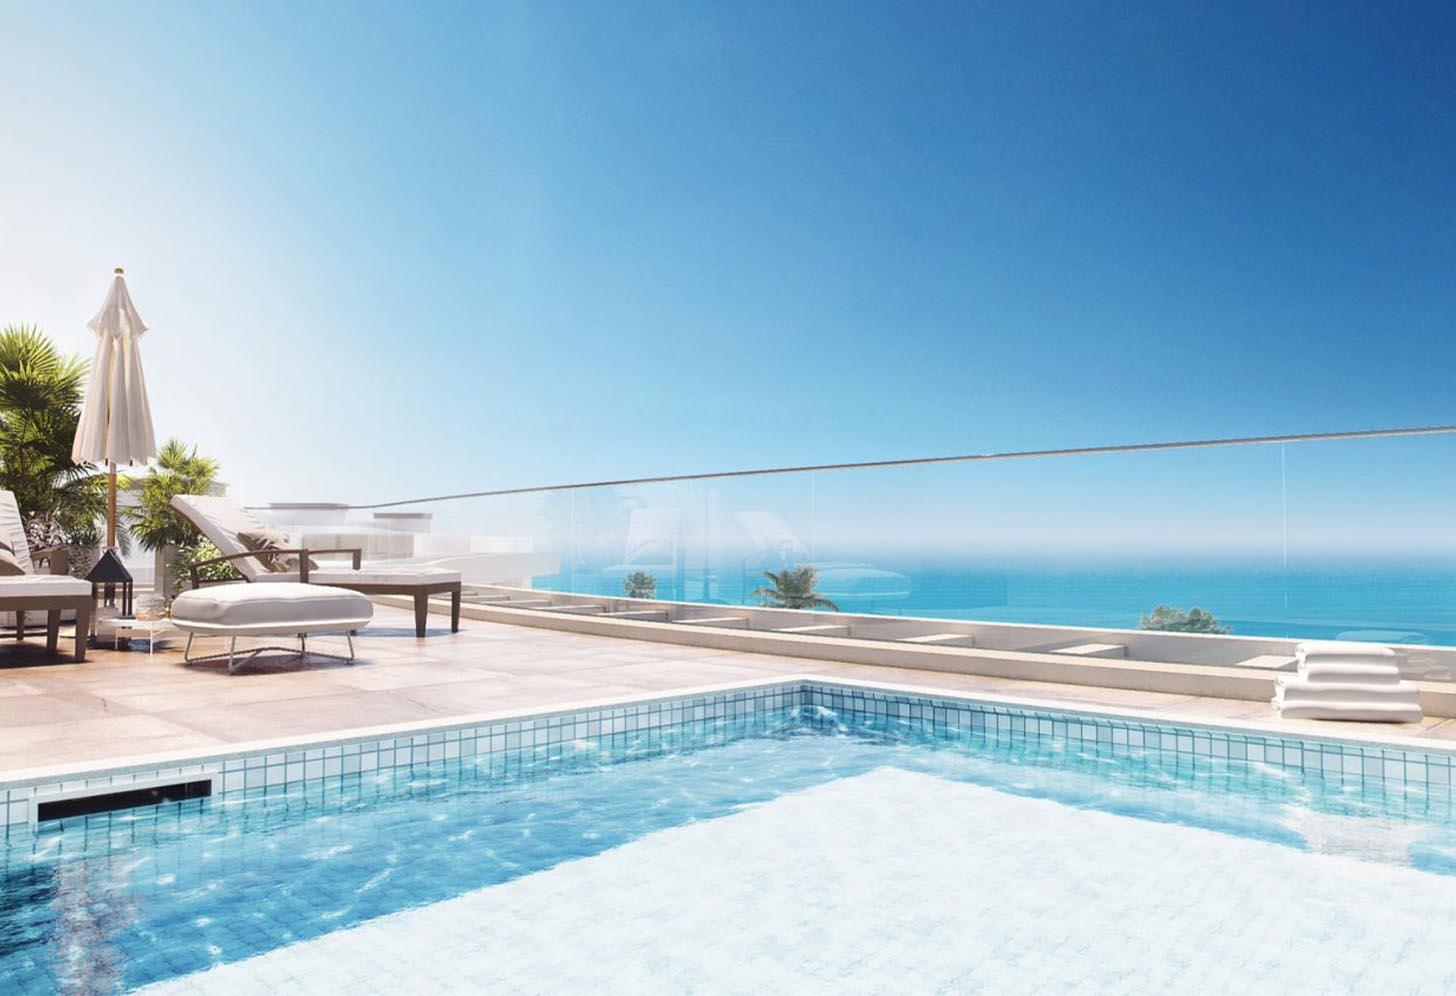 immobilier neuf espagne costa del sol on-e14 nereidas residential piscine 1